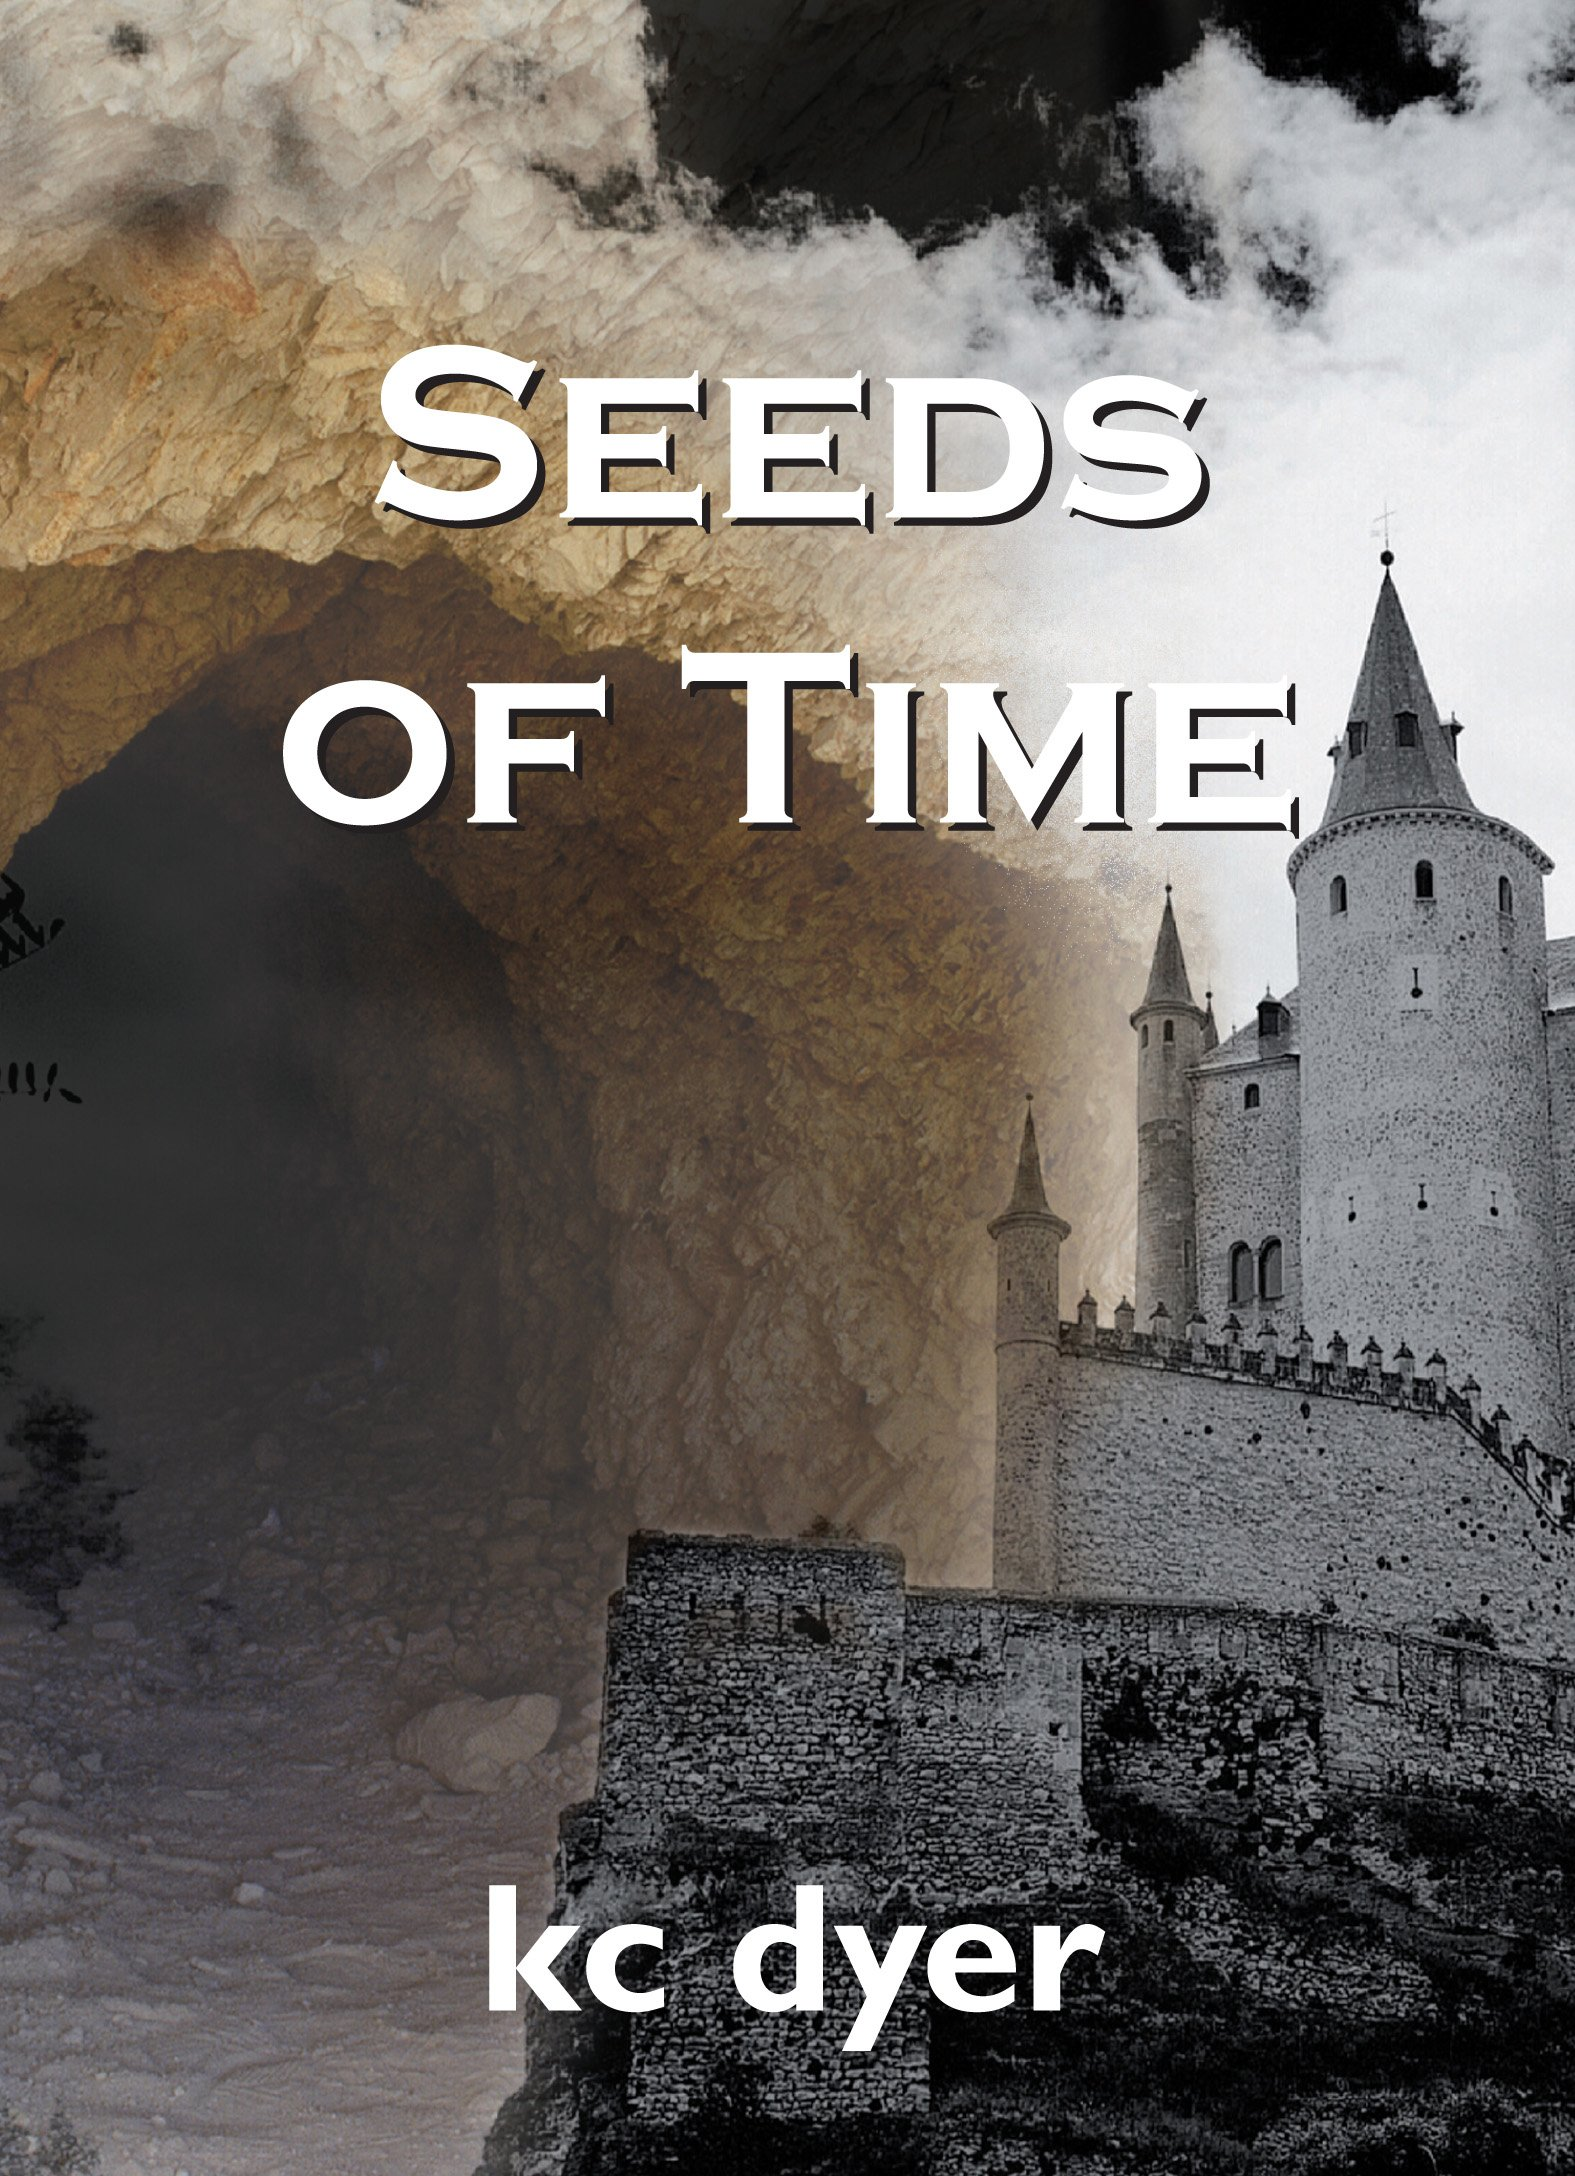 Seeds of Time: An Eagle Glen Trilogy Book: kc dyer: 9781550024142: Amazon.com: Books